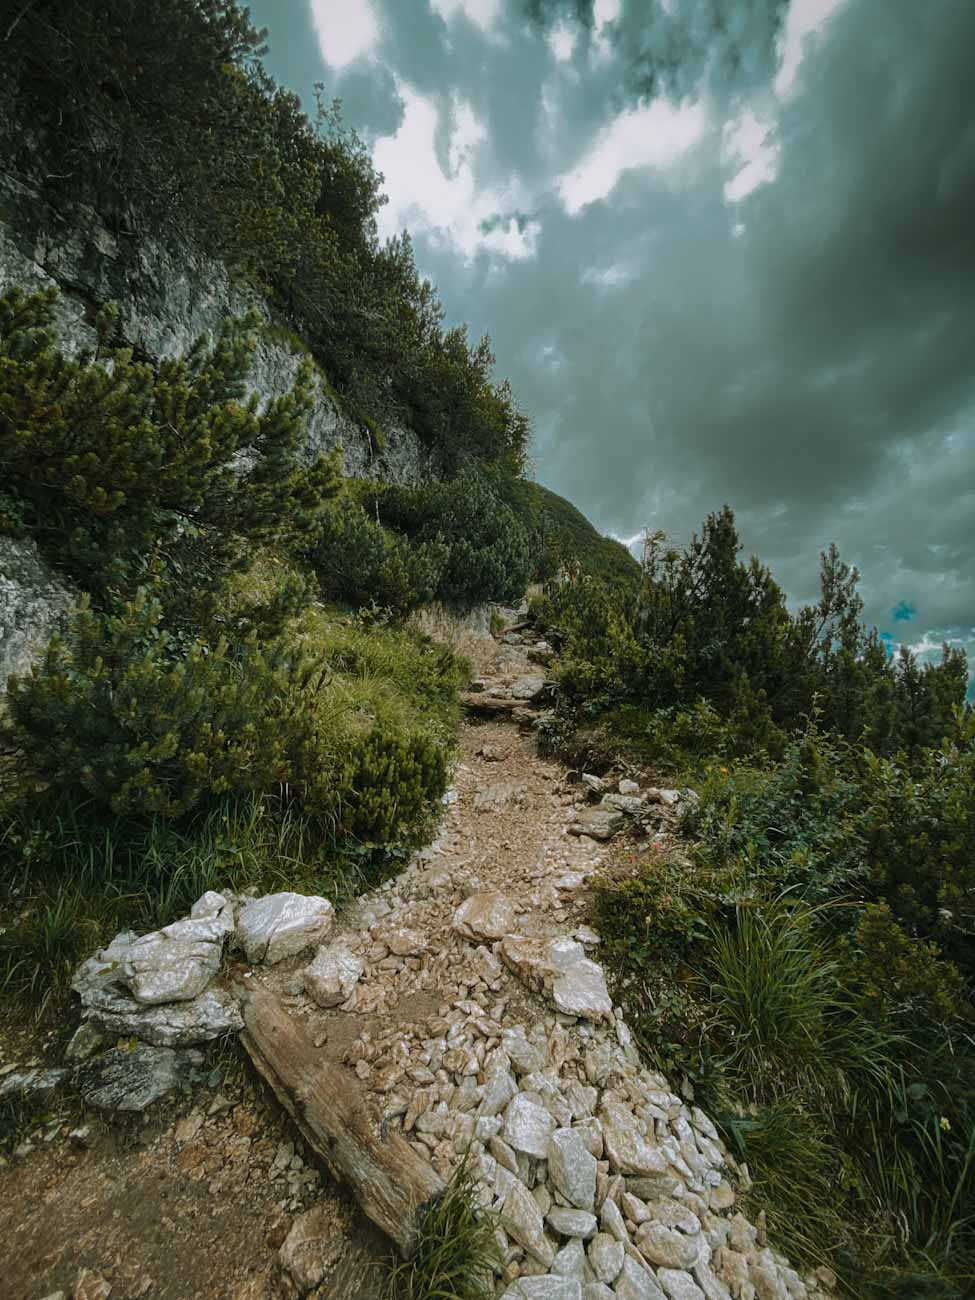 szlak 215, trekking w dolomitach nad jezioro Sorapis